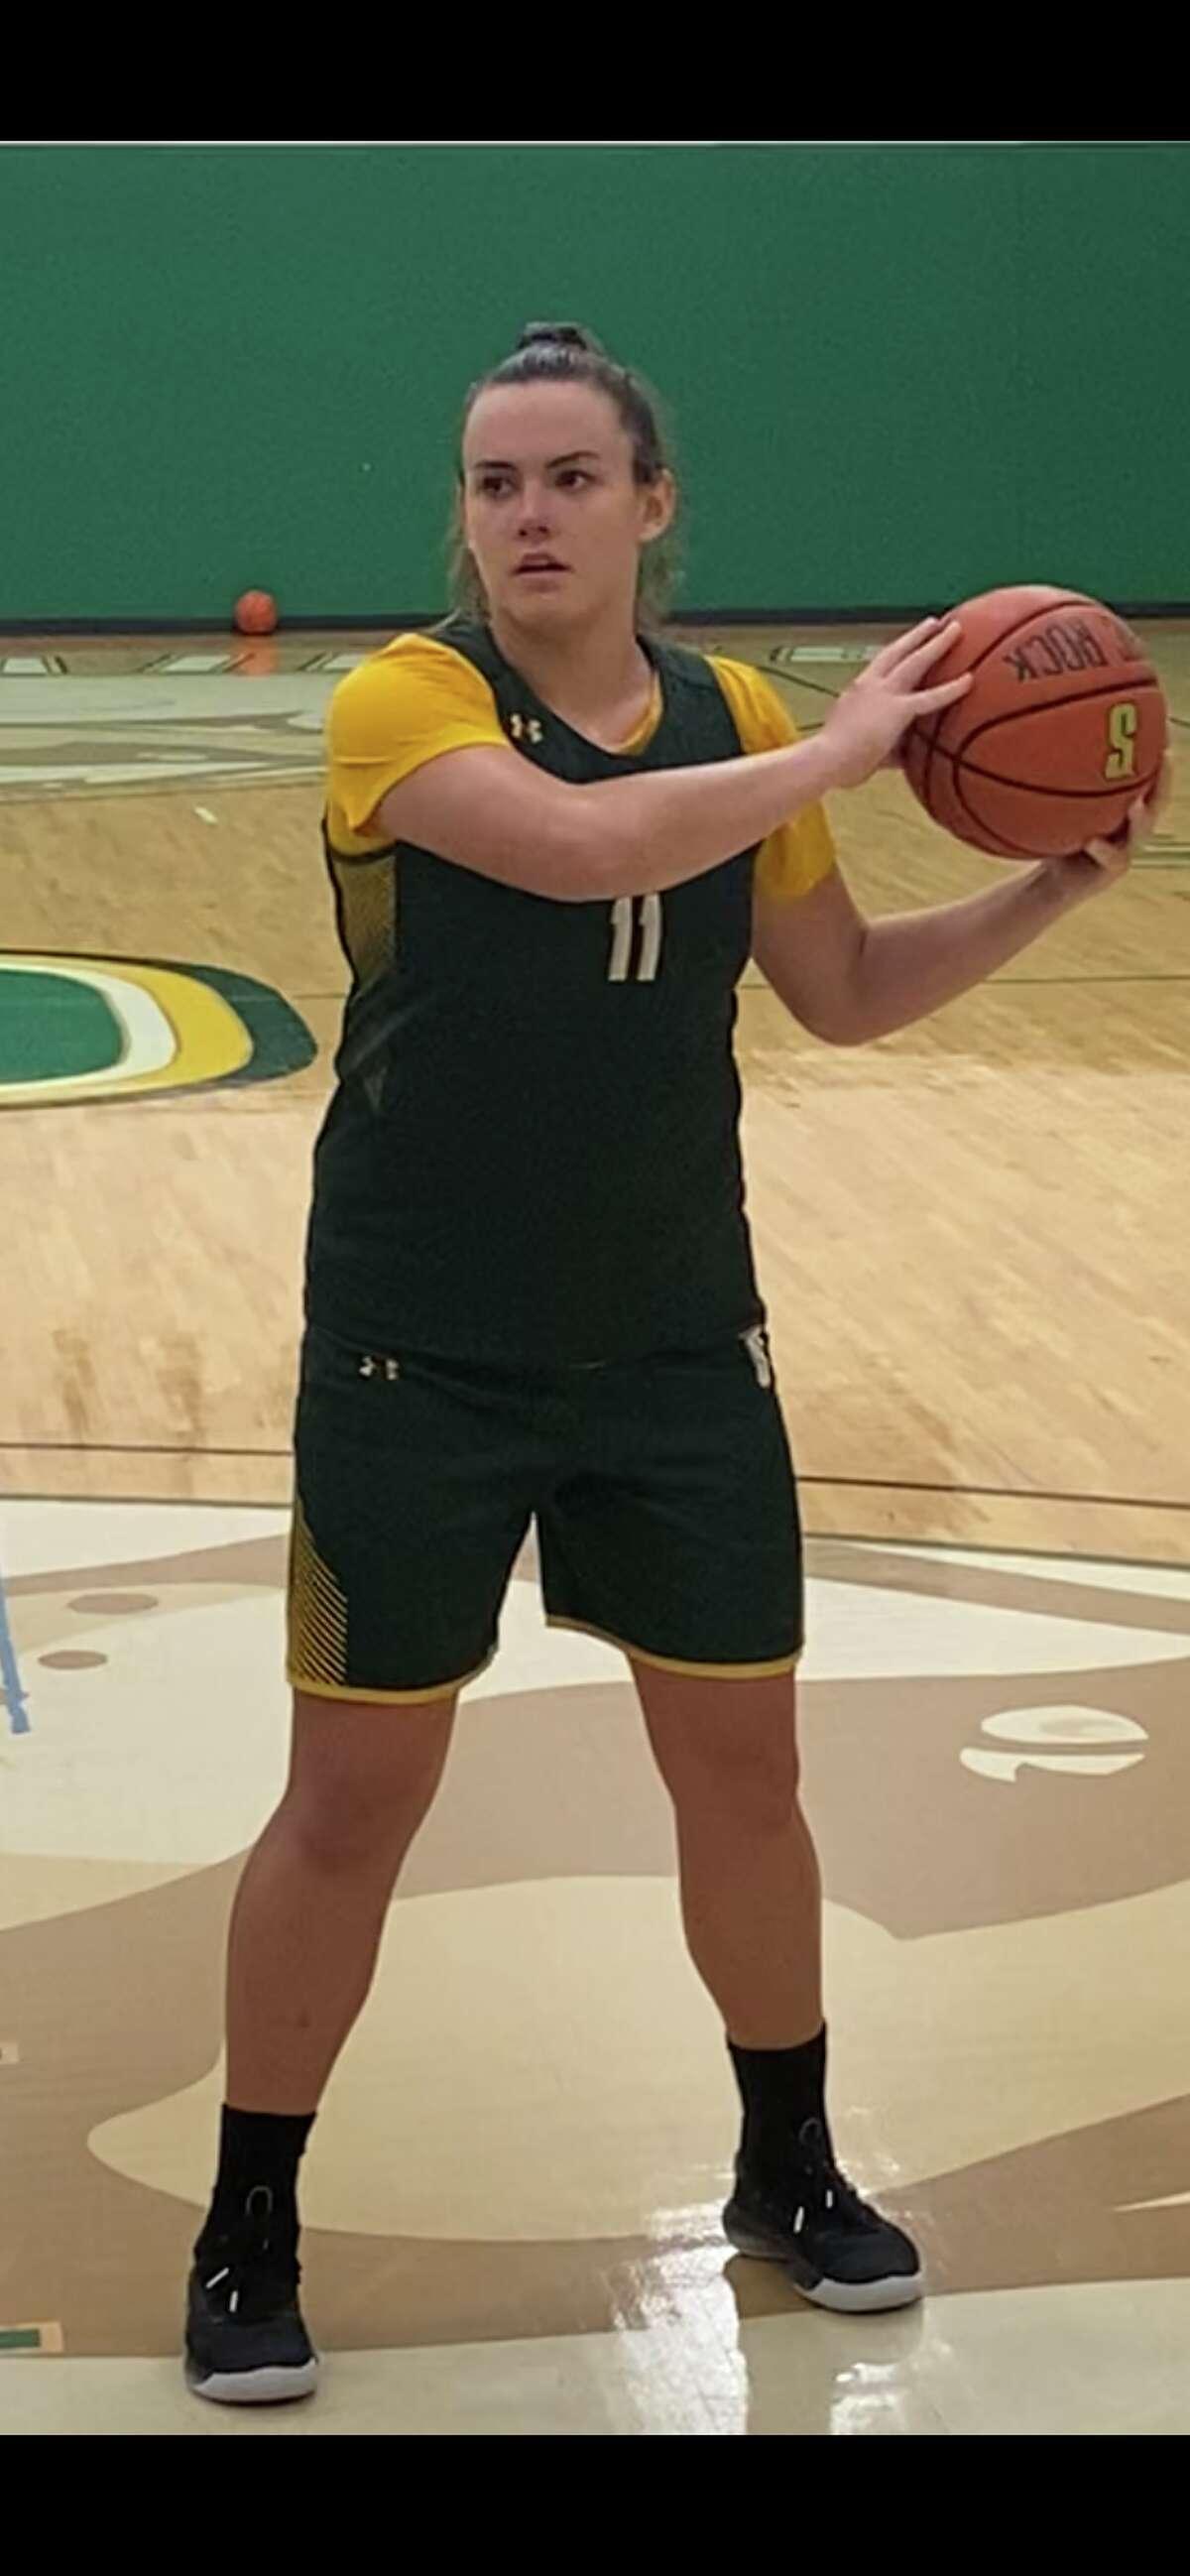 Siena freshman forward Julia Hauer was named state Class A Player of the Year at Seton Catholic in Binghamton. (Mark Singelais/Times Union)